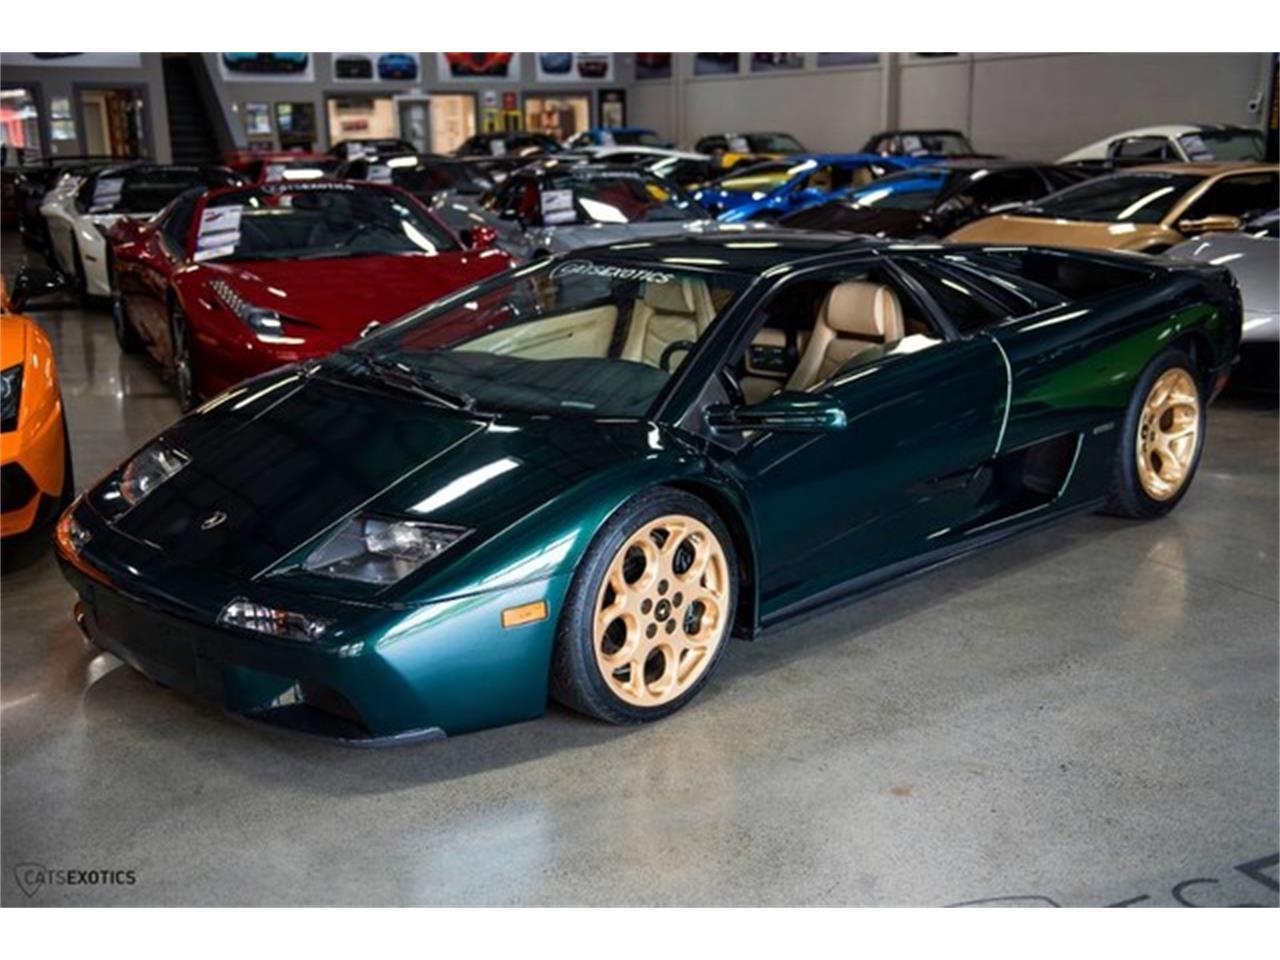 Large Picture of '01 Lamborghini Diablo located in Washington - $375,000.00 - KWB9